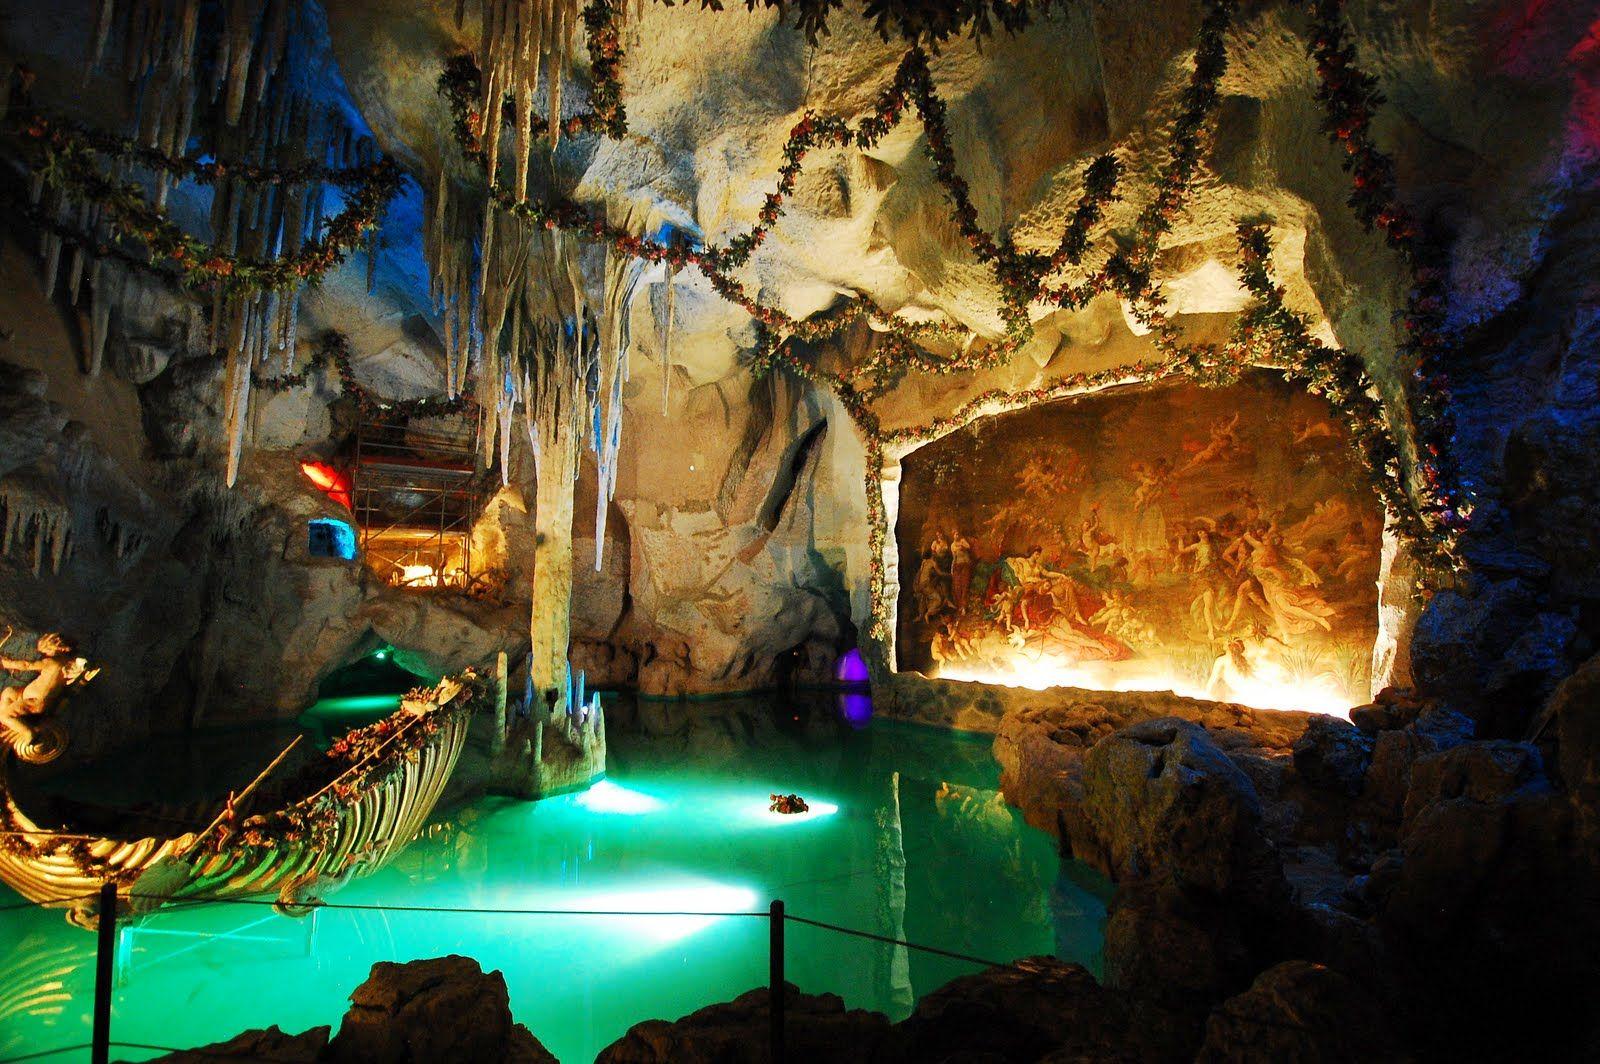 Linderhof Grotto Google Search Linderhof Palace Grotto Castle